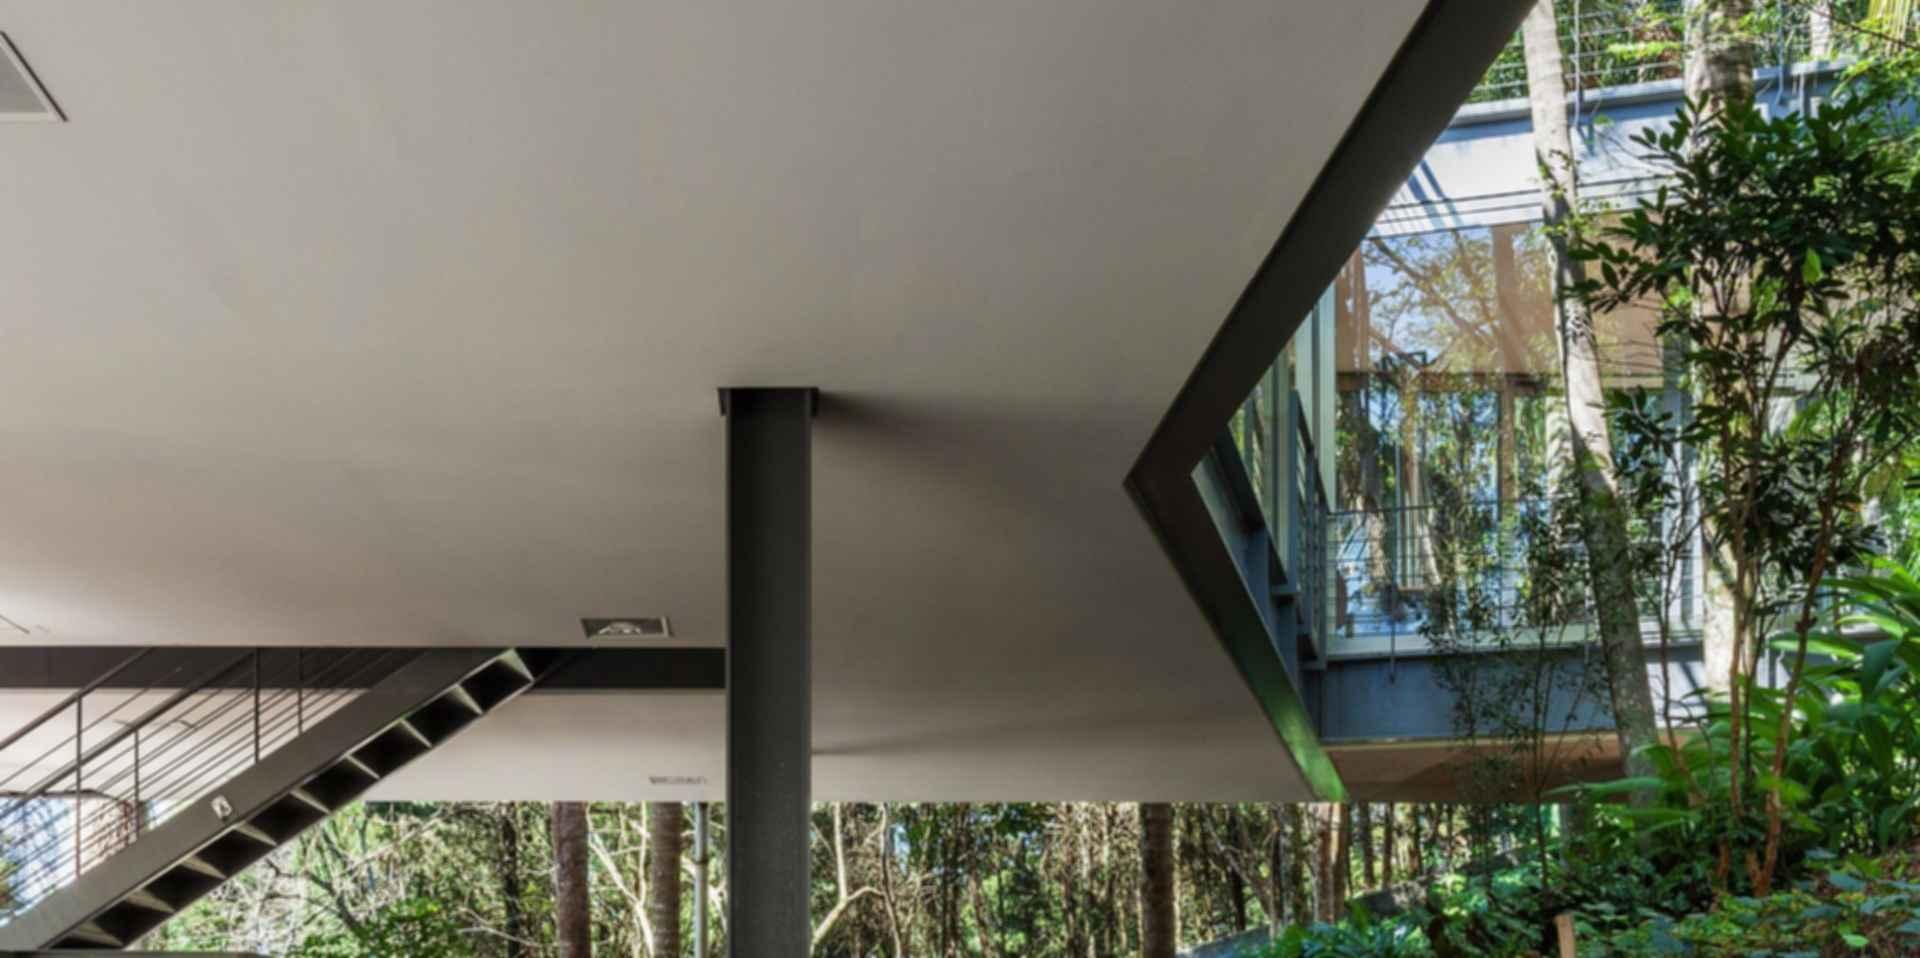 LLM House - Exterior/Steel Beam